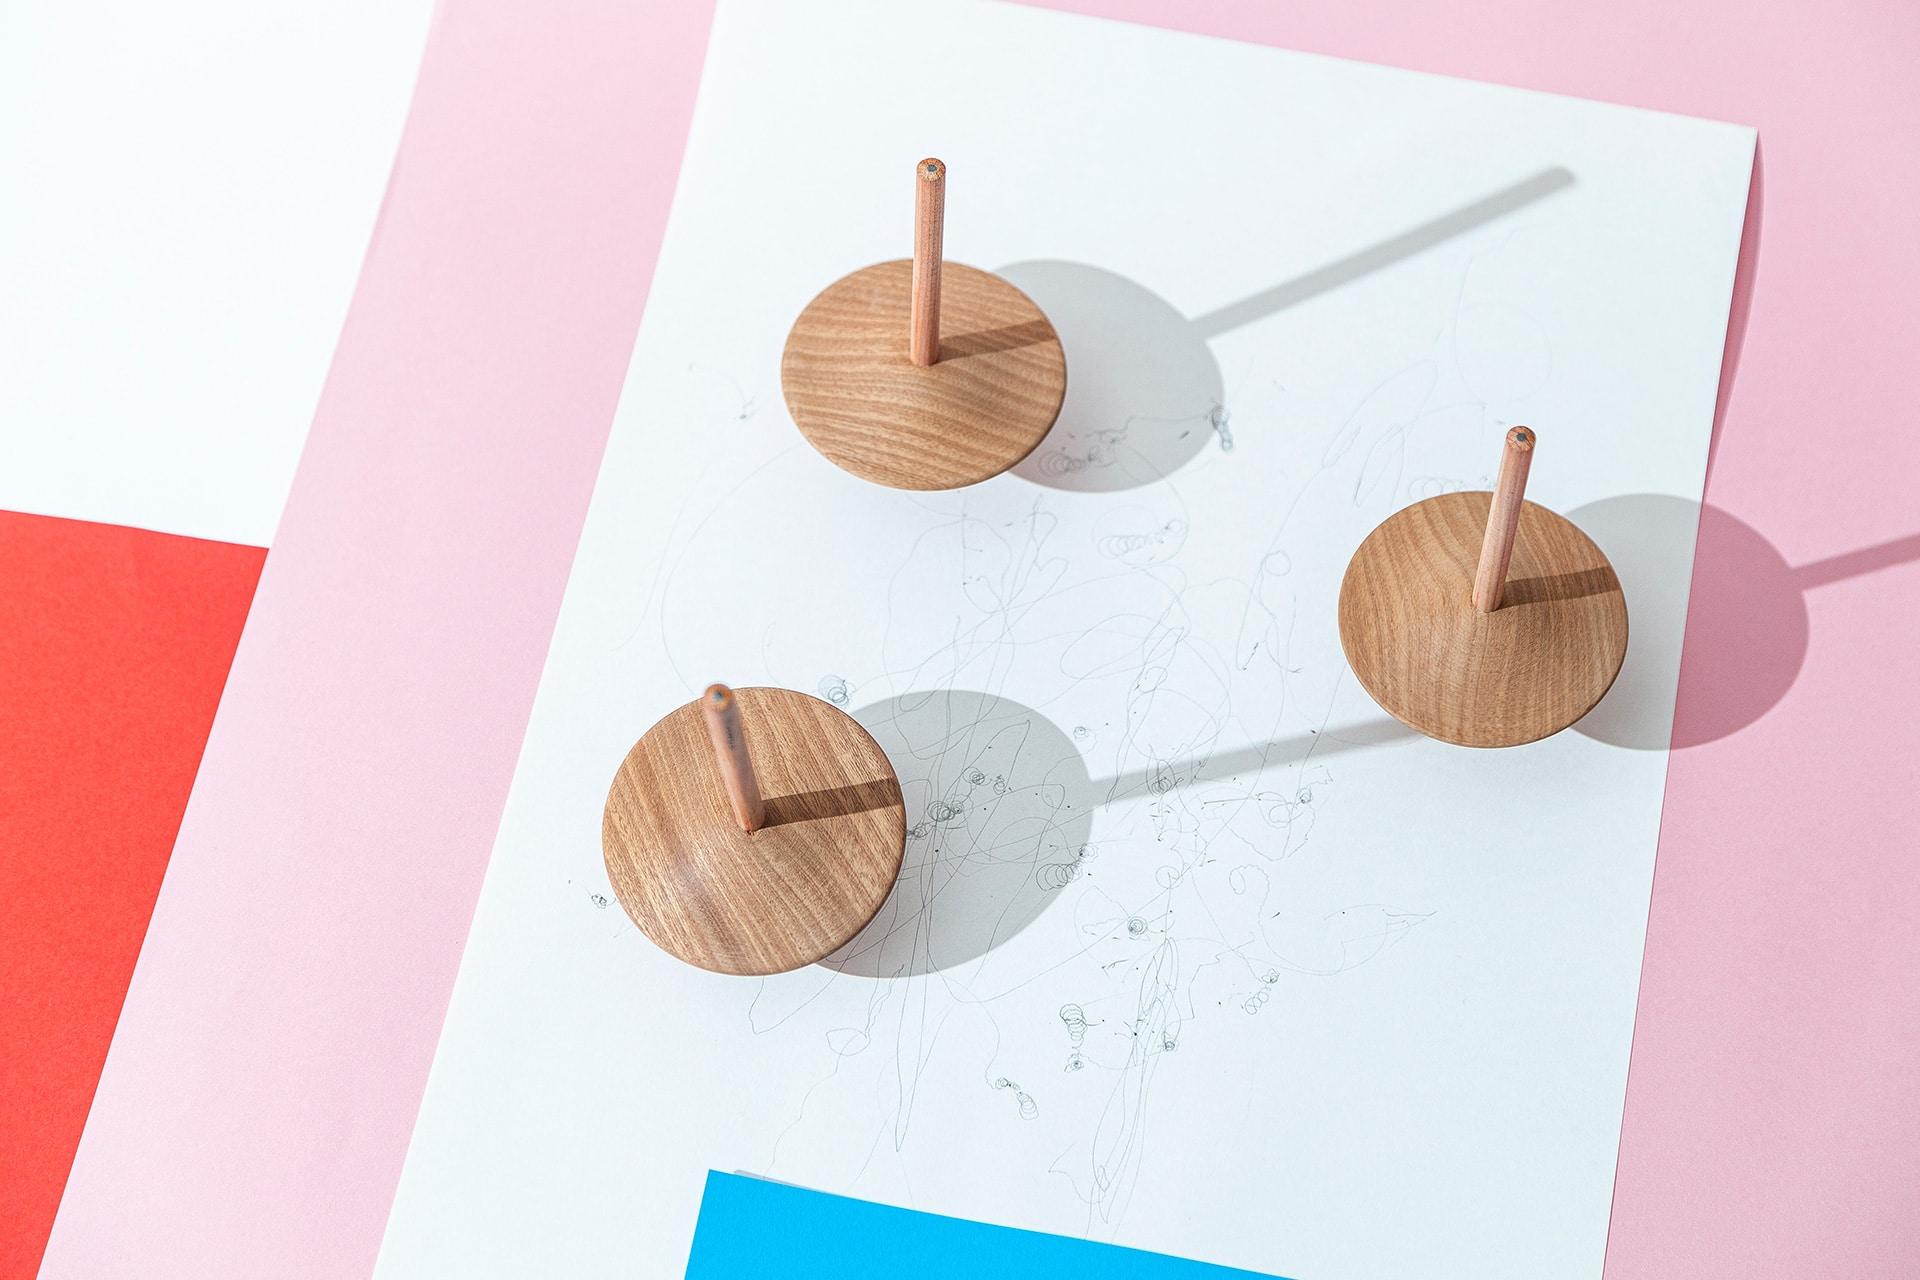 TurnIt Design -DESIGN BY MIGUEL SOEIRO